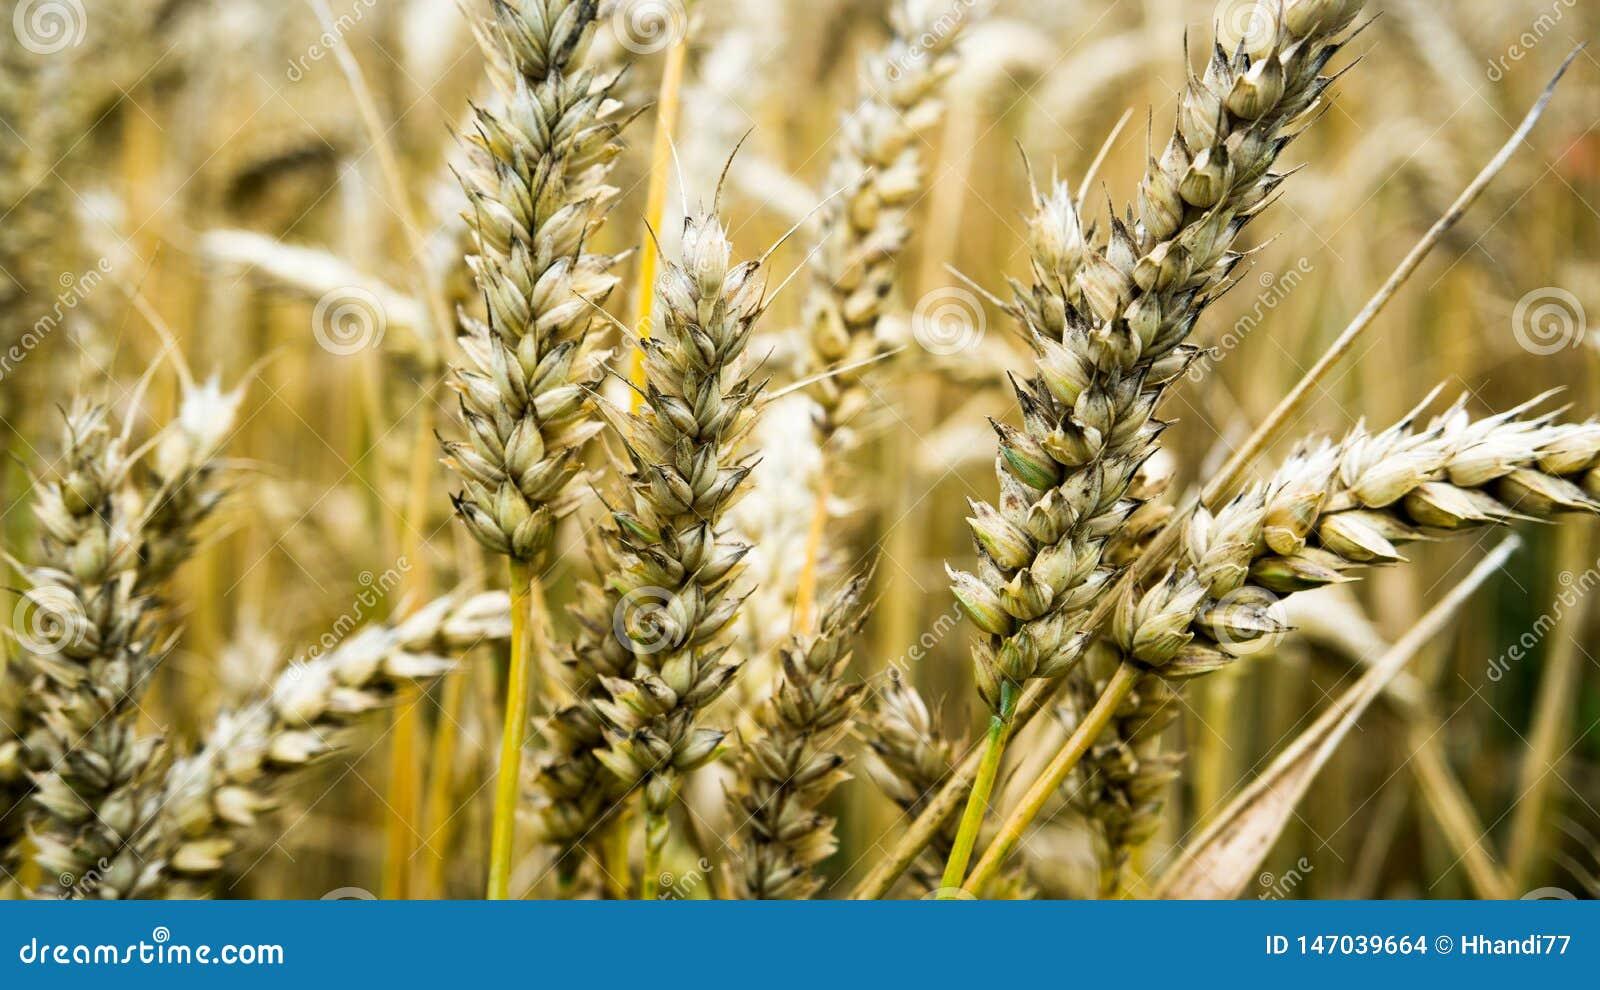 Closeup of a wheat ear on farmland